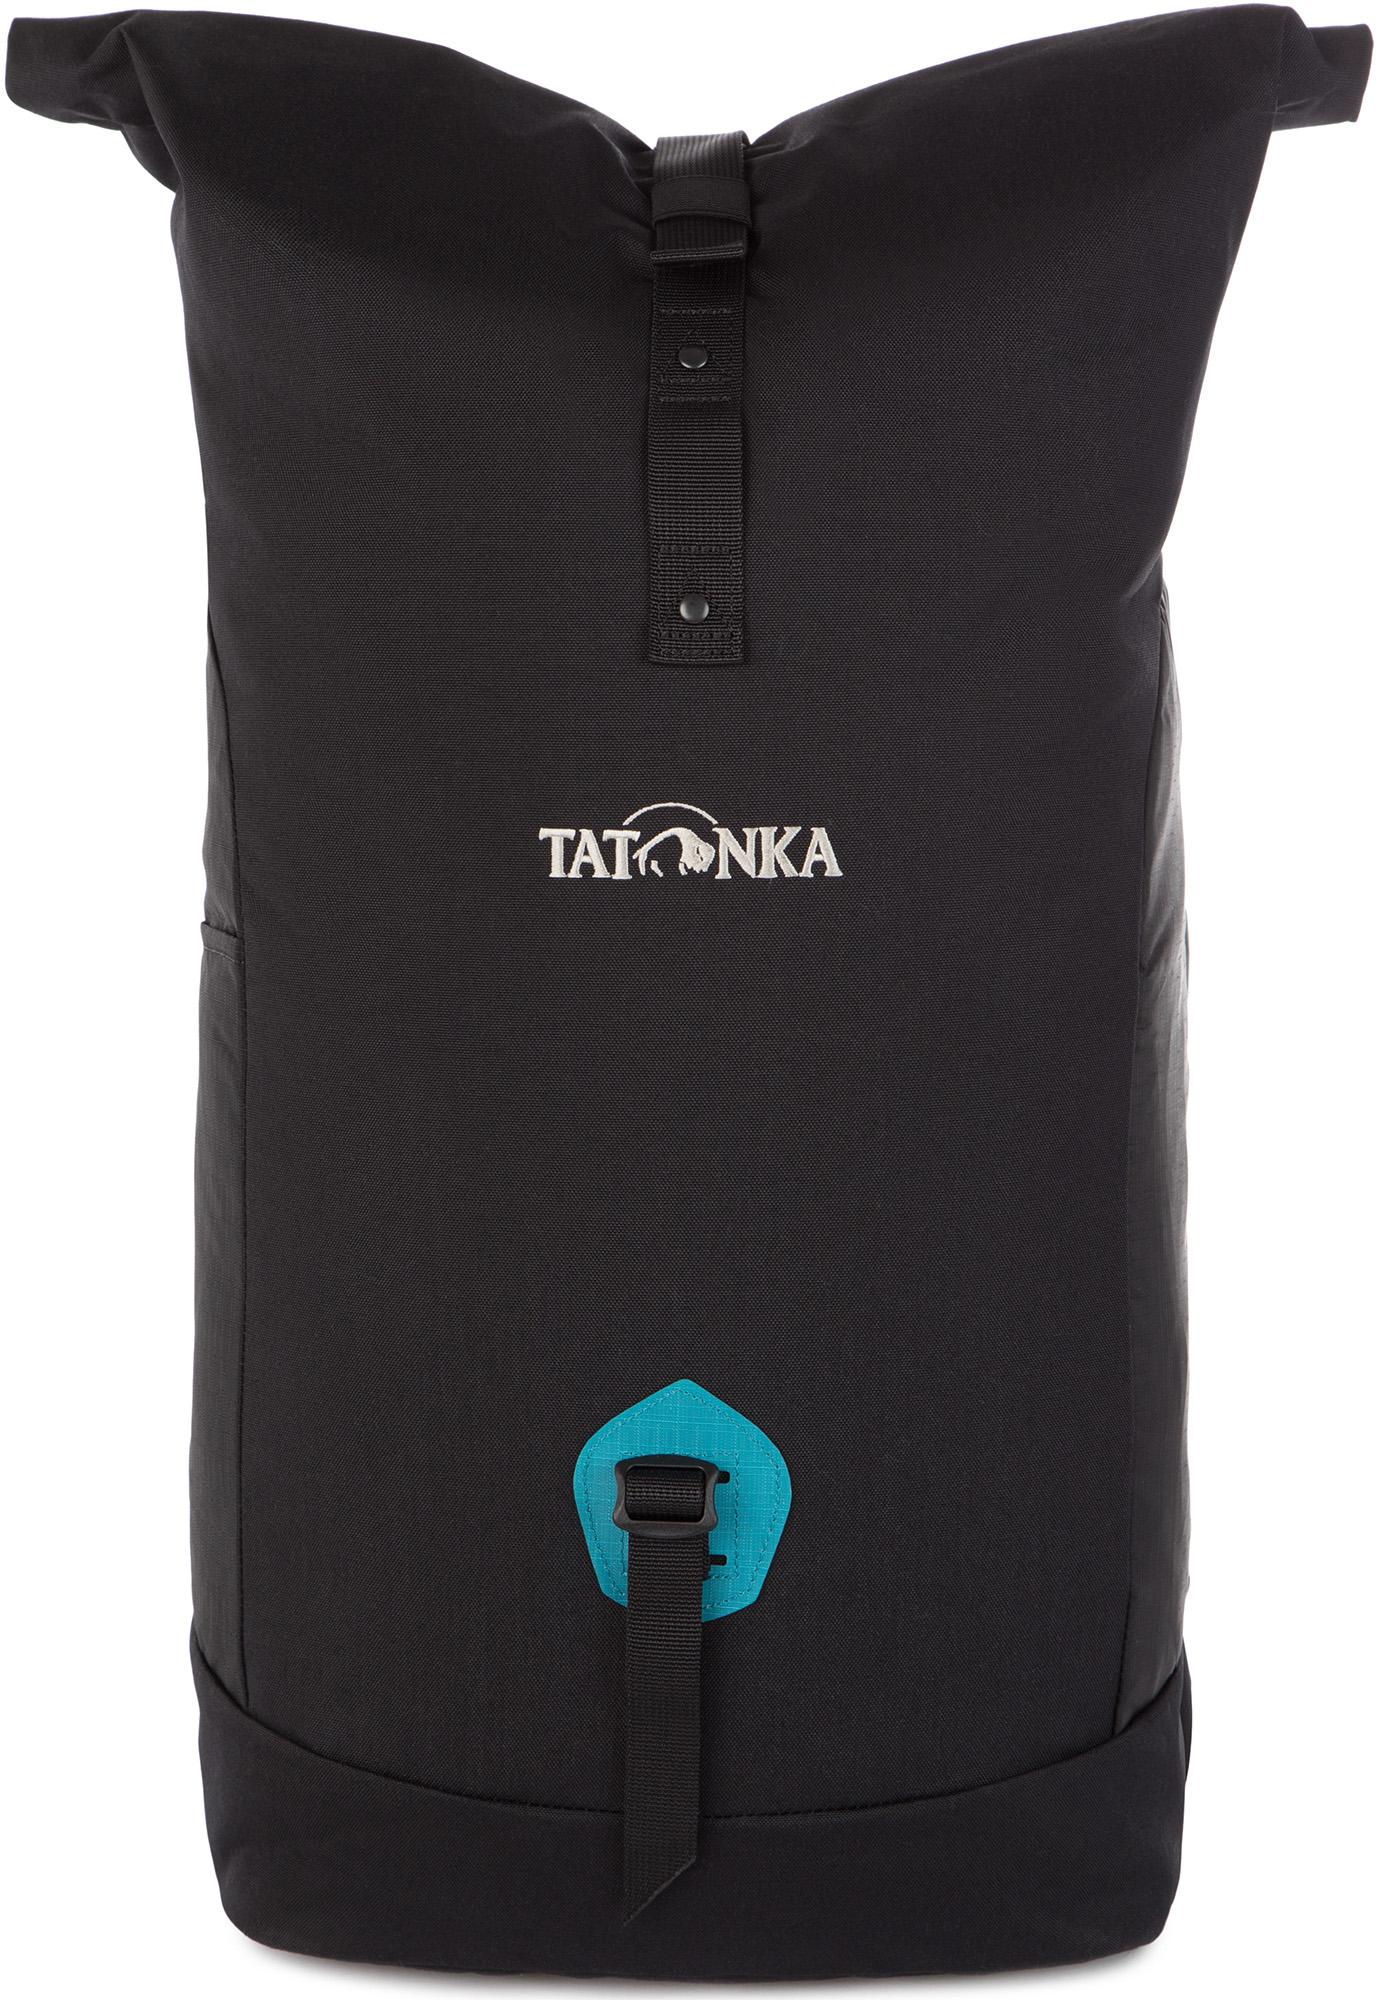 цена Tatonka Tatonka Grip Rolltop Pack S онлайн в 2017 году